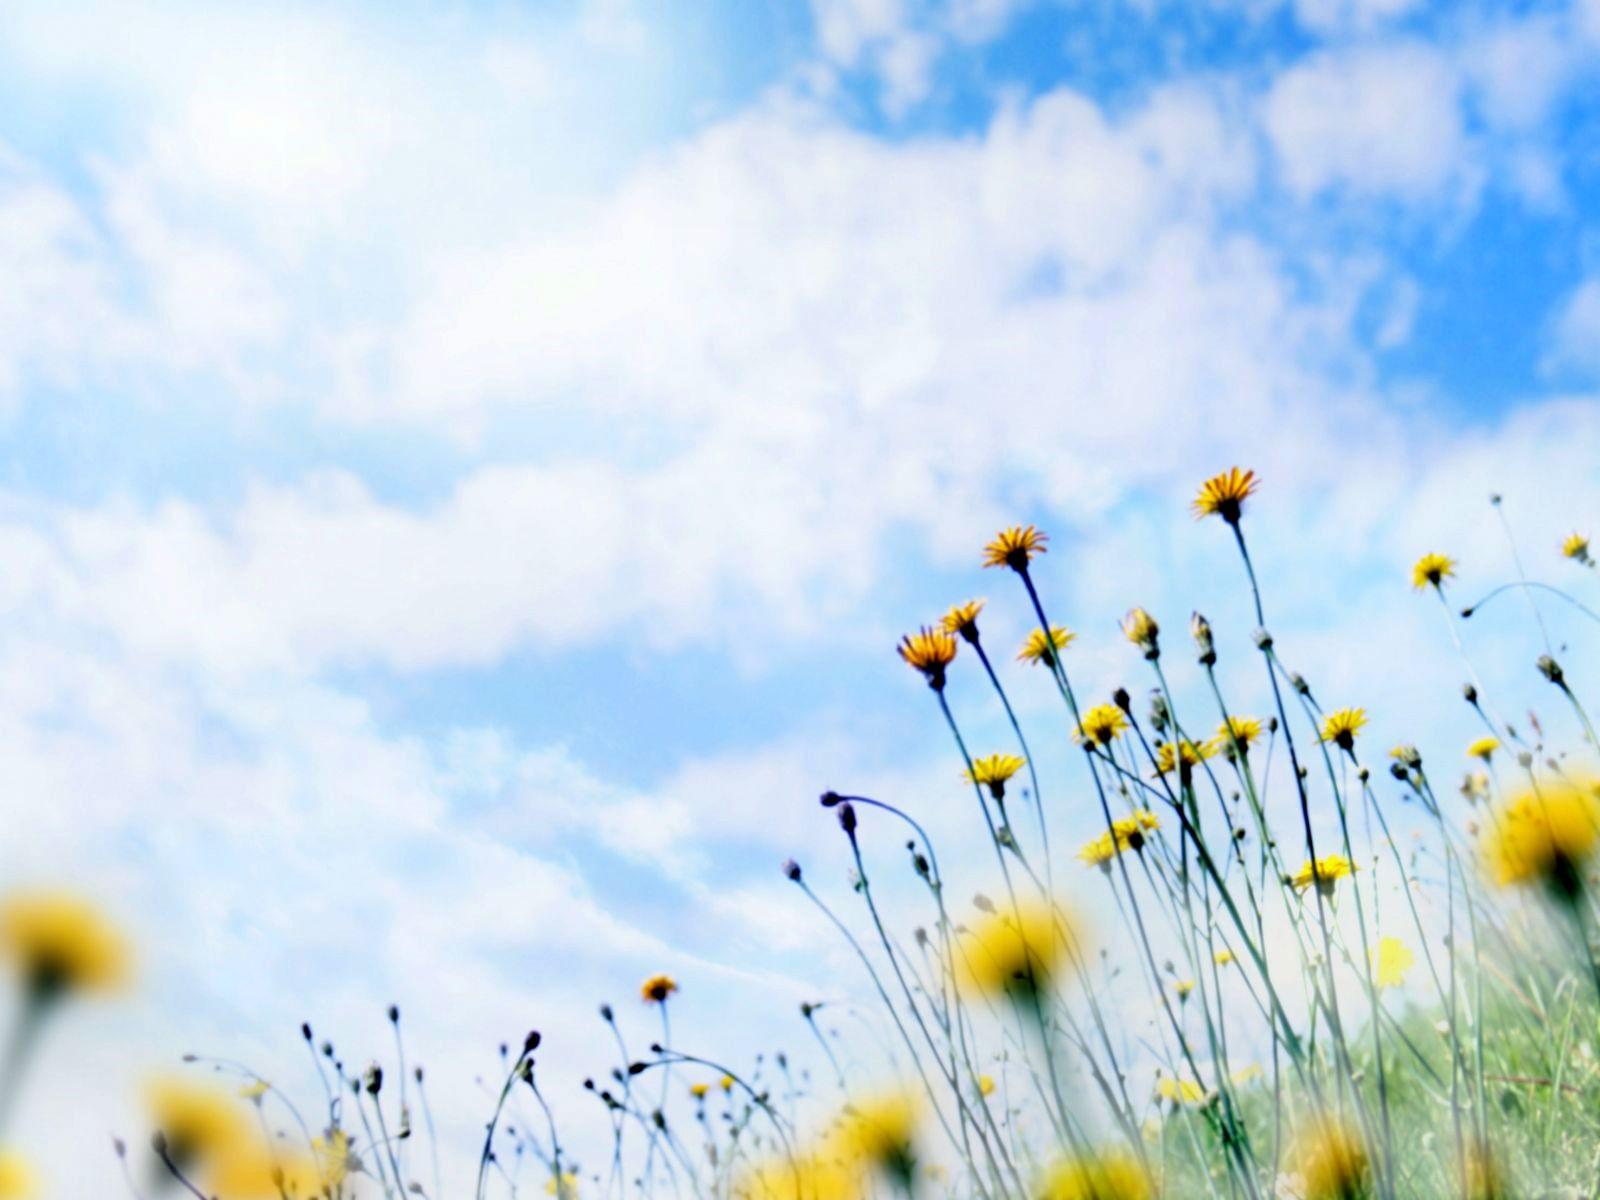 http://1.bp.blogspot.com/_fTSPcnSTTyc/TPR6TM3SowI/AAAAAAAADTI/qRqlz9IW-e4/s1600/Wallpaper_Windows_7_-_Meadow_flowers.jpg